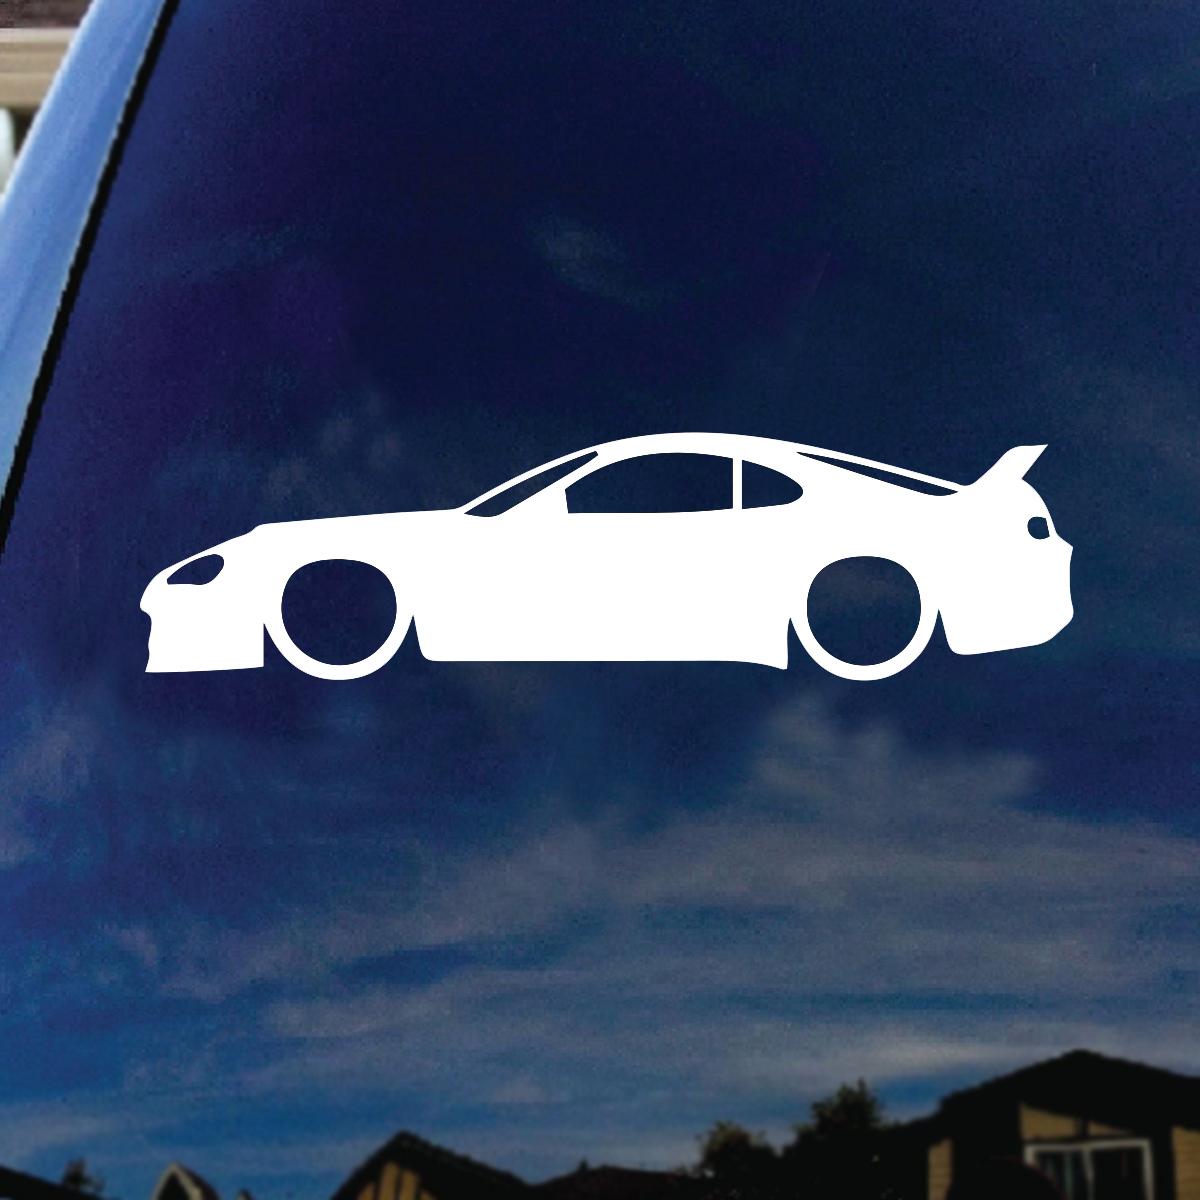 JDM Car Silhouette Car Window Vinyl Decal Sticker 5\